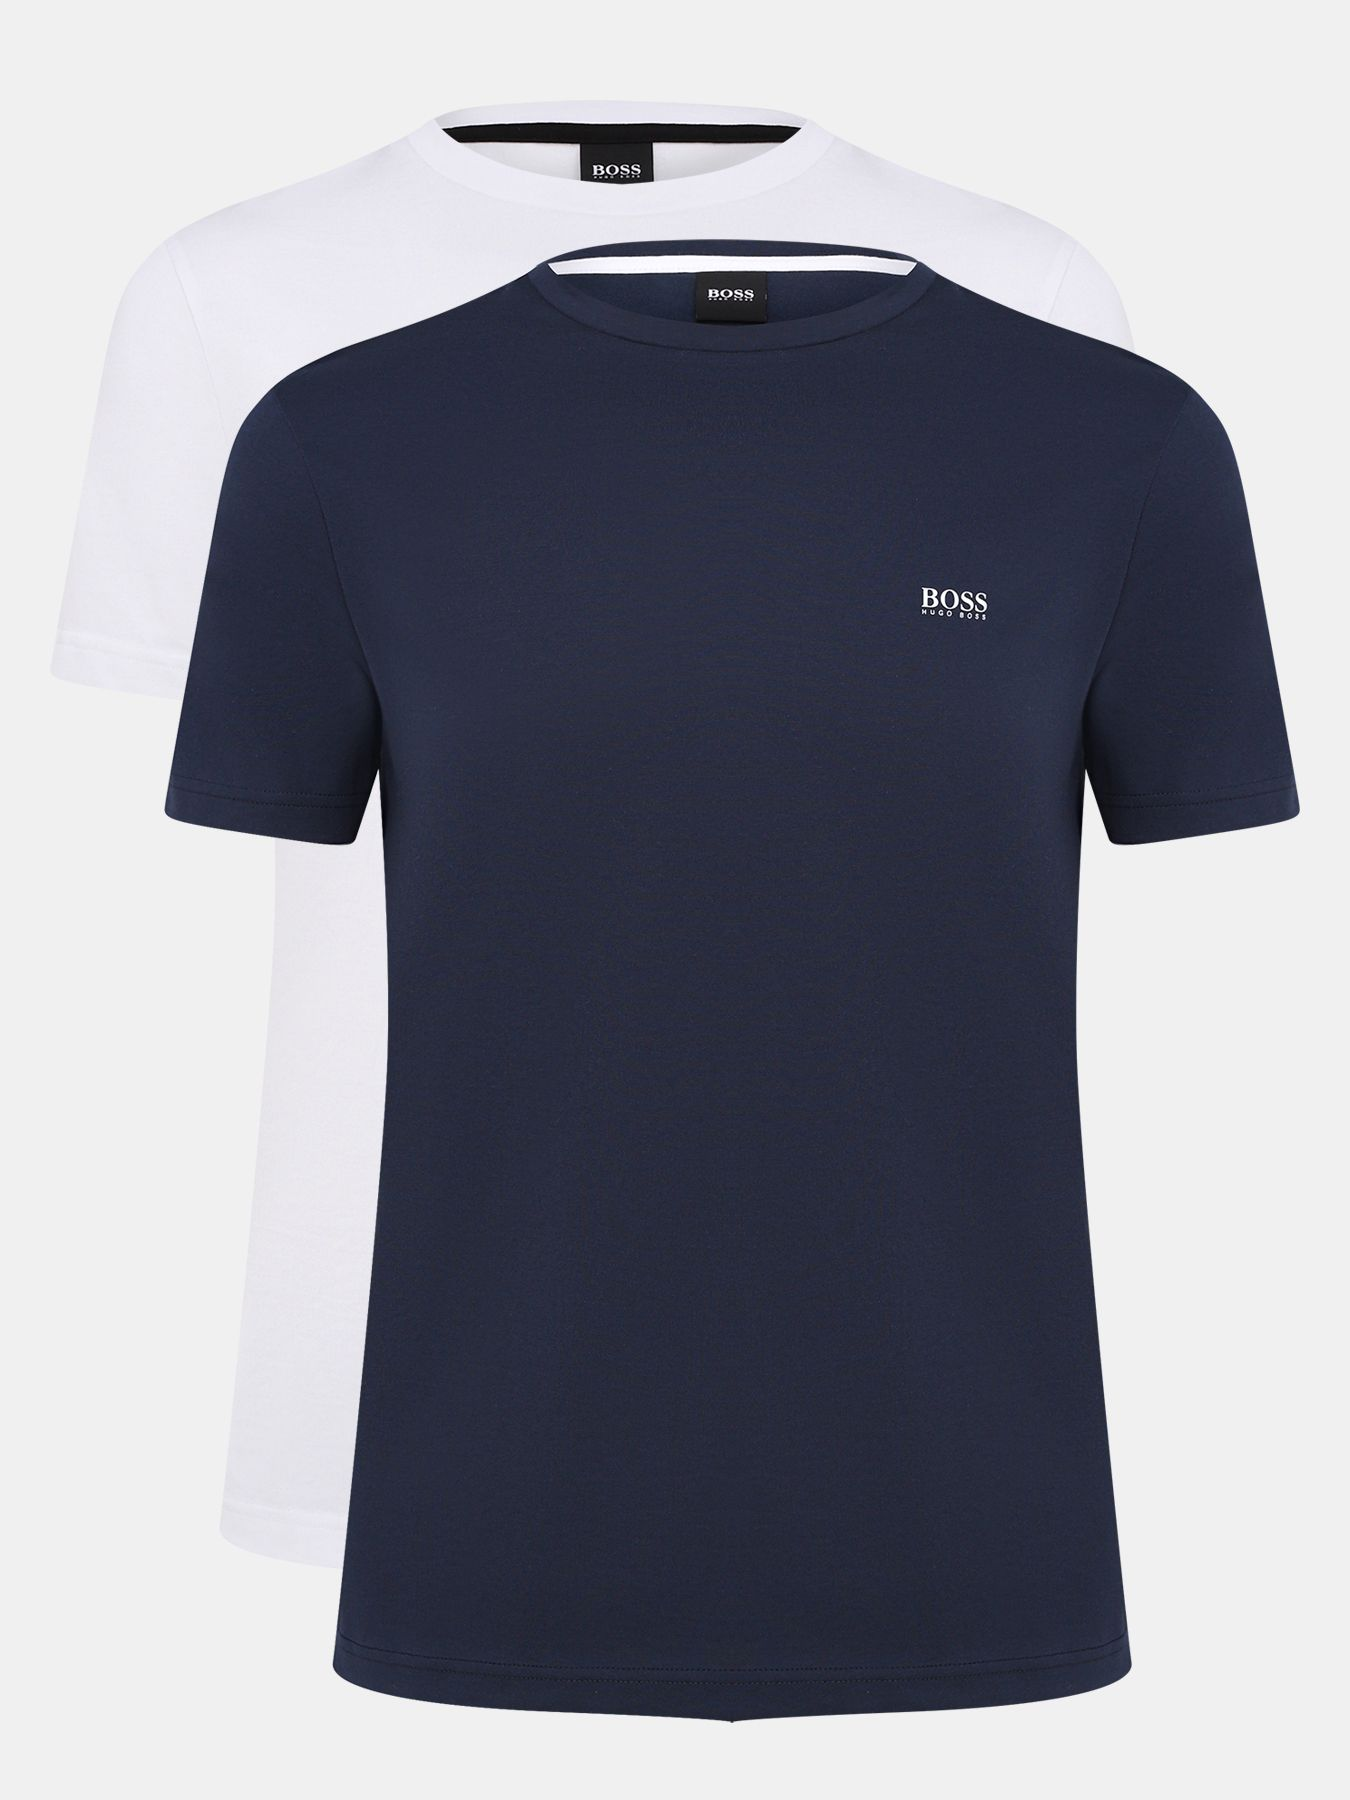 Футболки BOSS Футболка T-Shirt (2 шт)